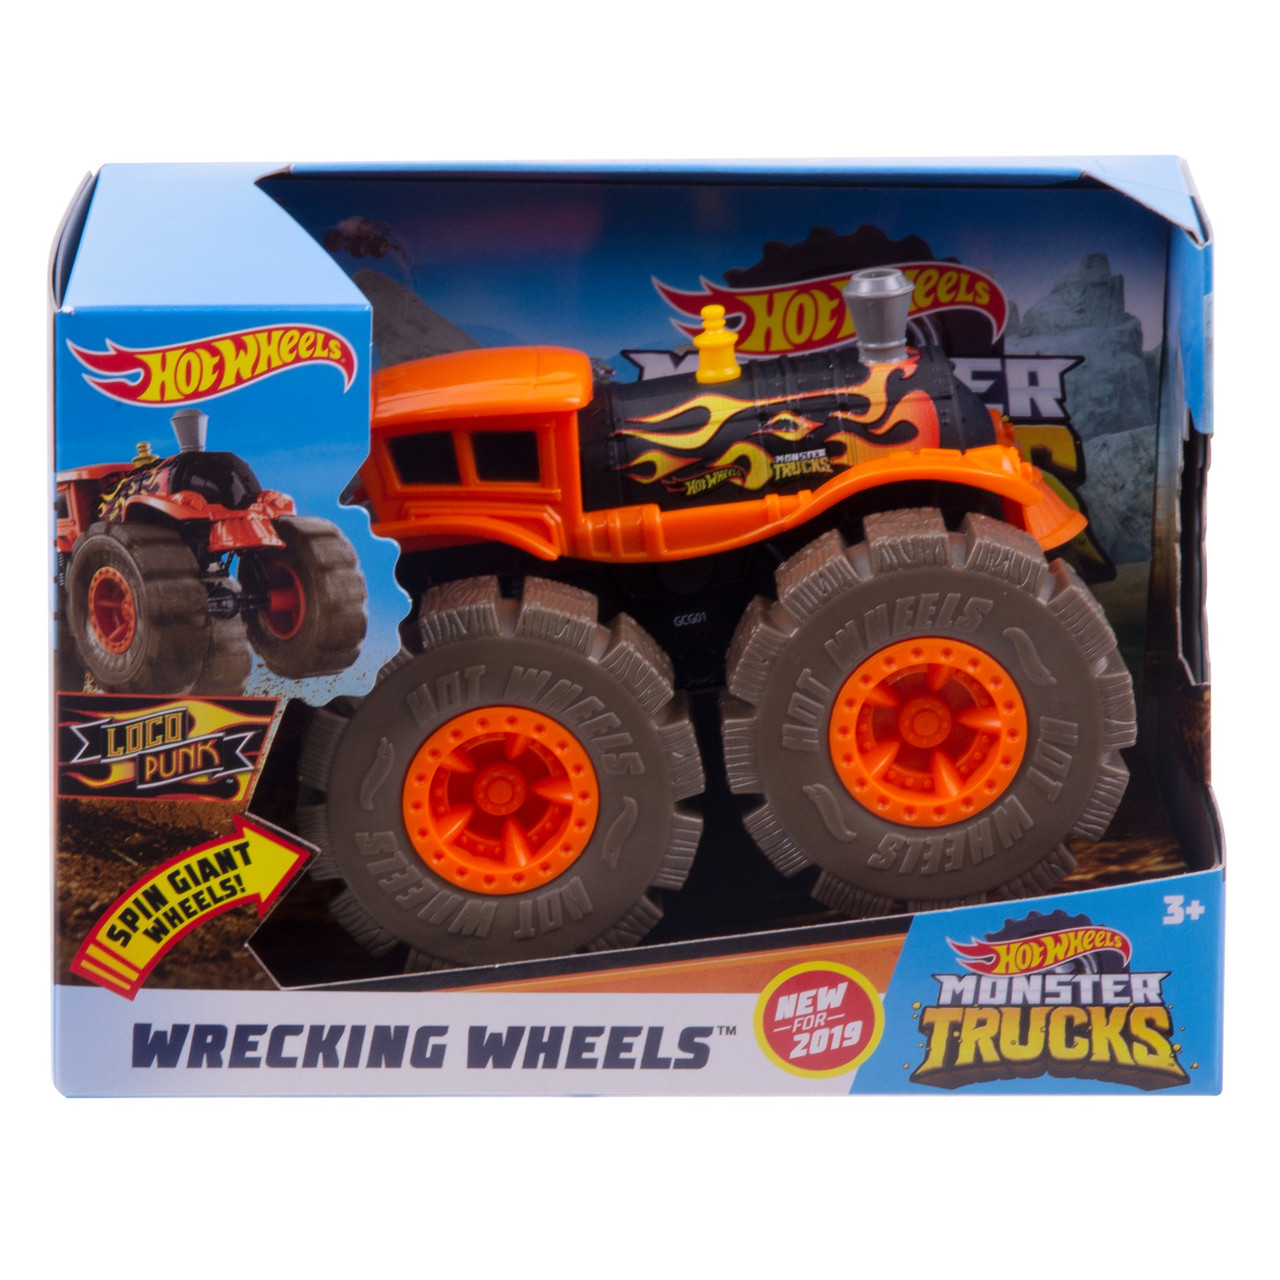 Хот Вилс Монстер Трак LOCO PUNK, Hot Wheels Monster Truck, Mattel (GCG02)